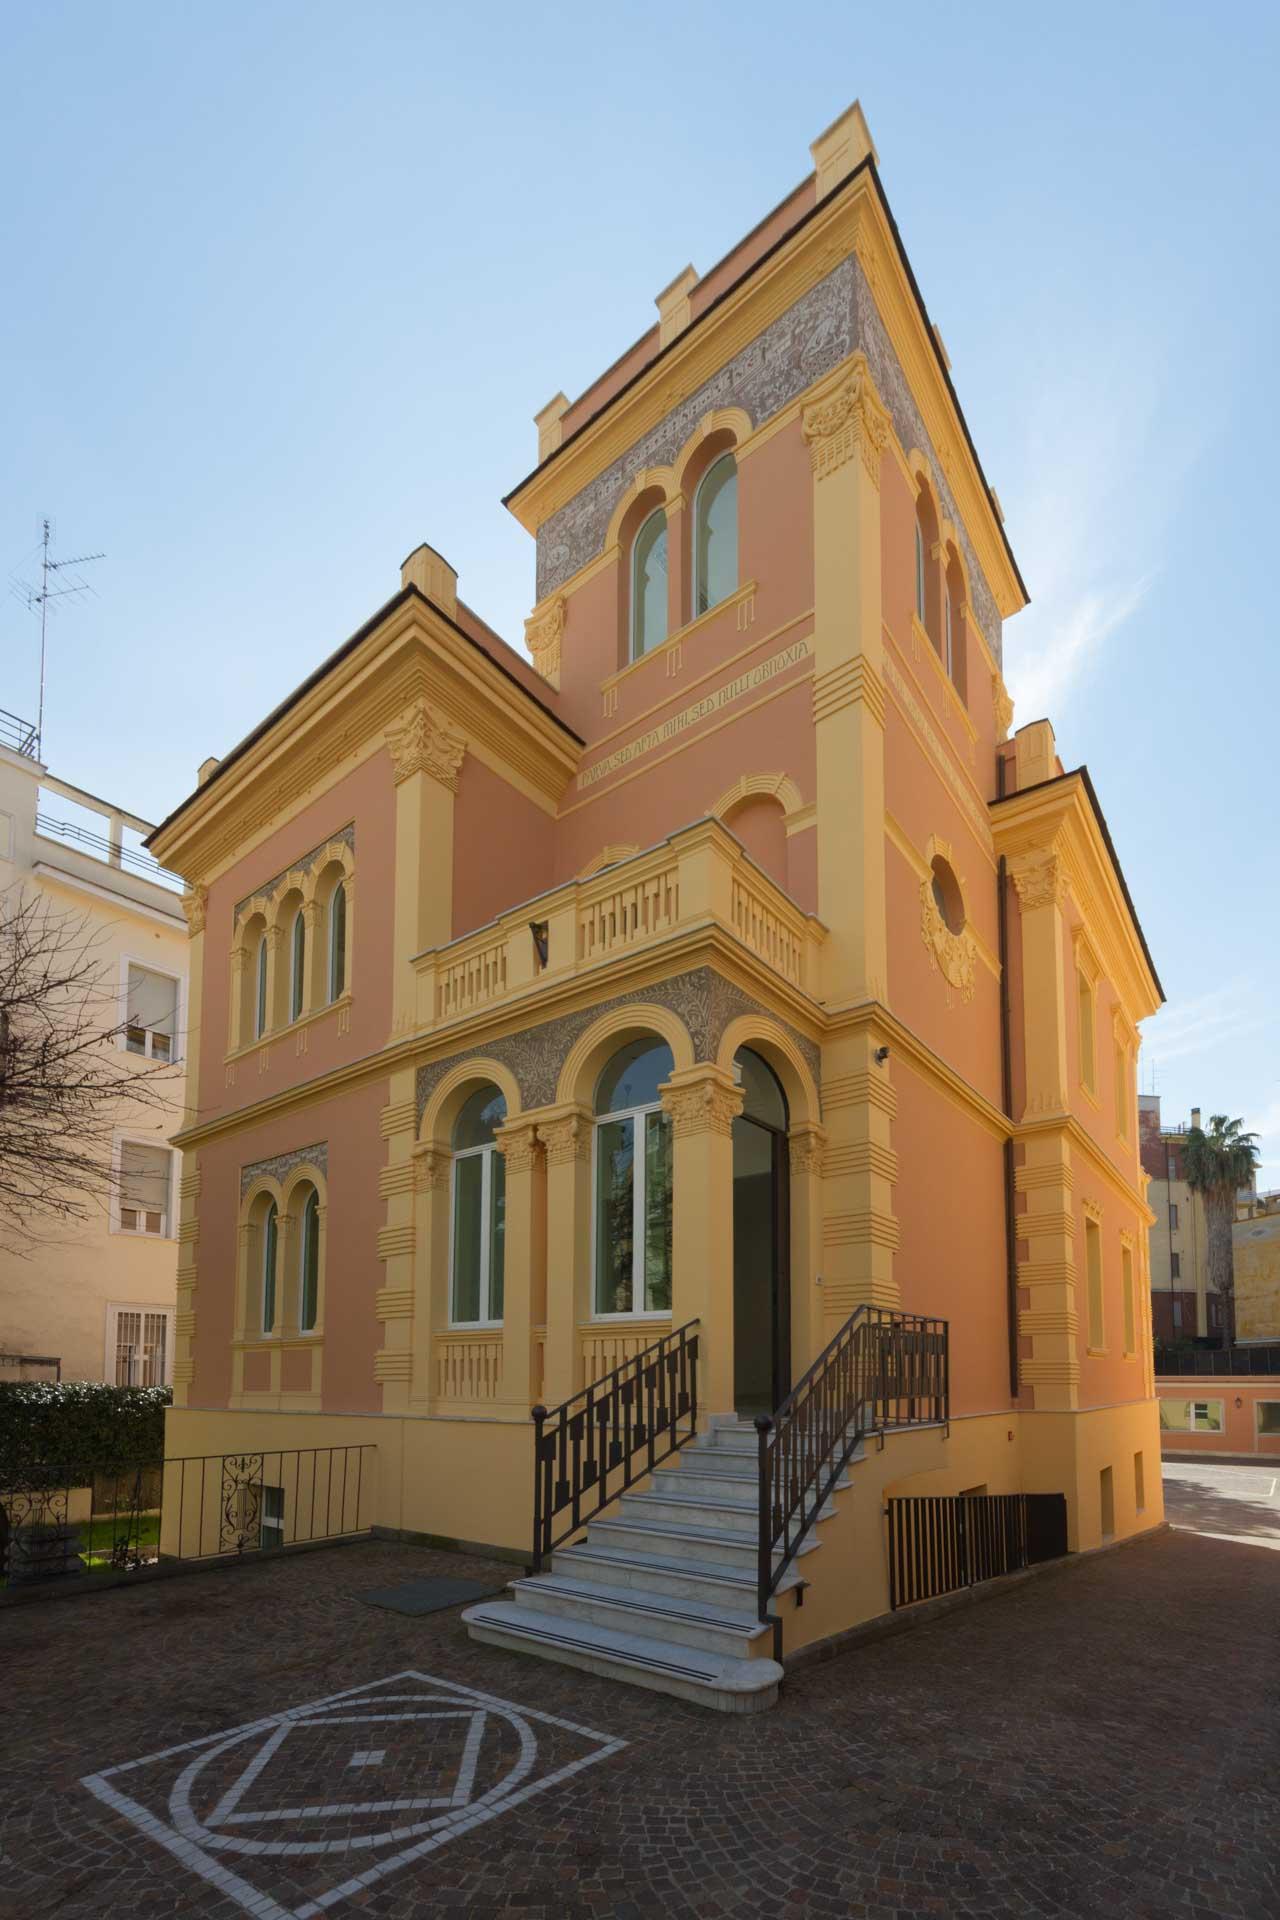 Head Office for Lease in Rome Italy – Unique Art-Nouveau Villa